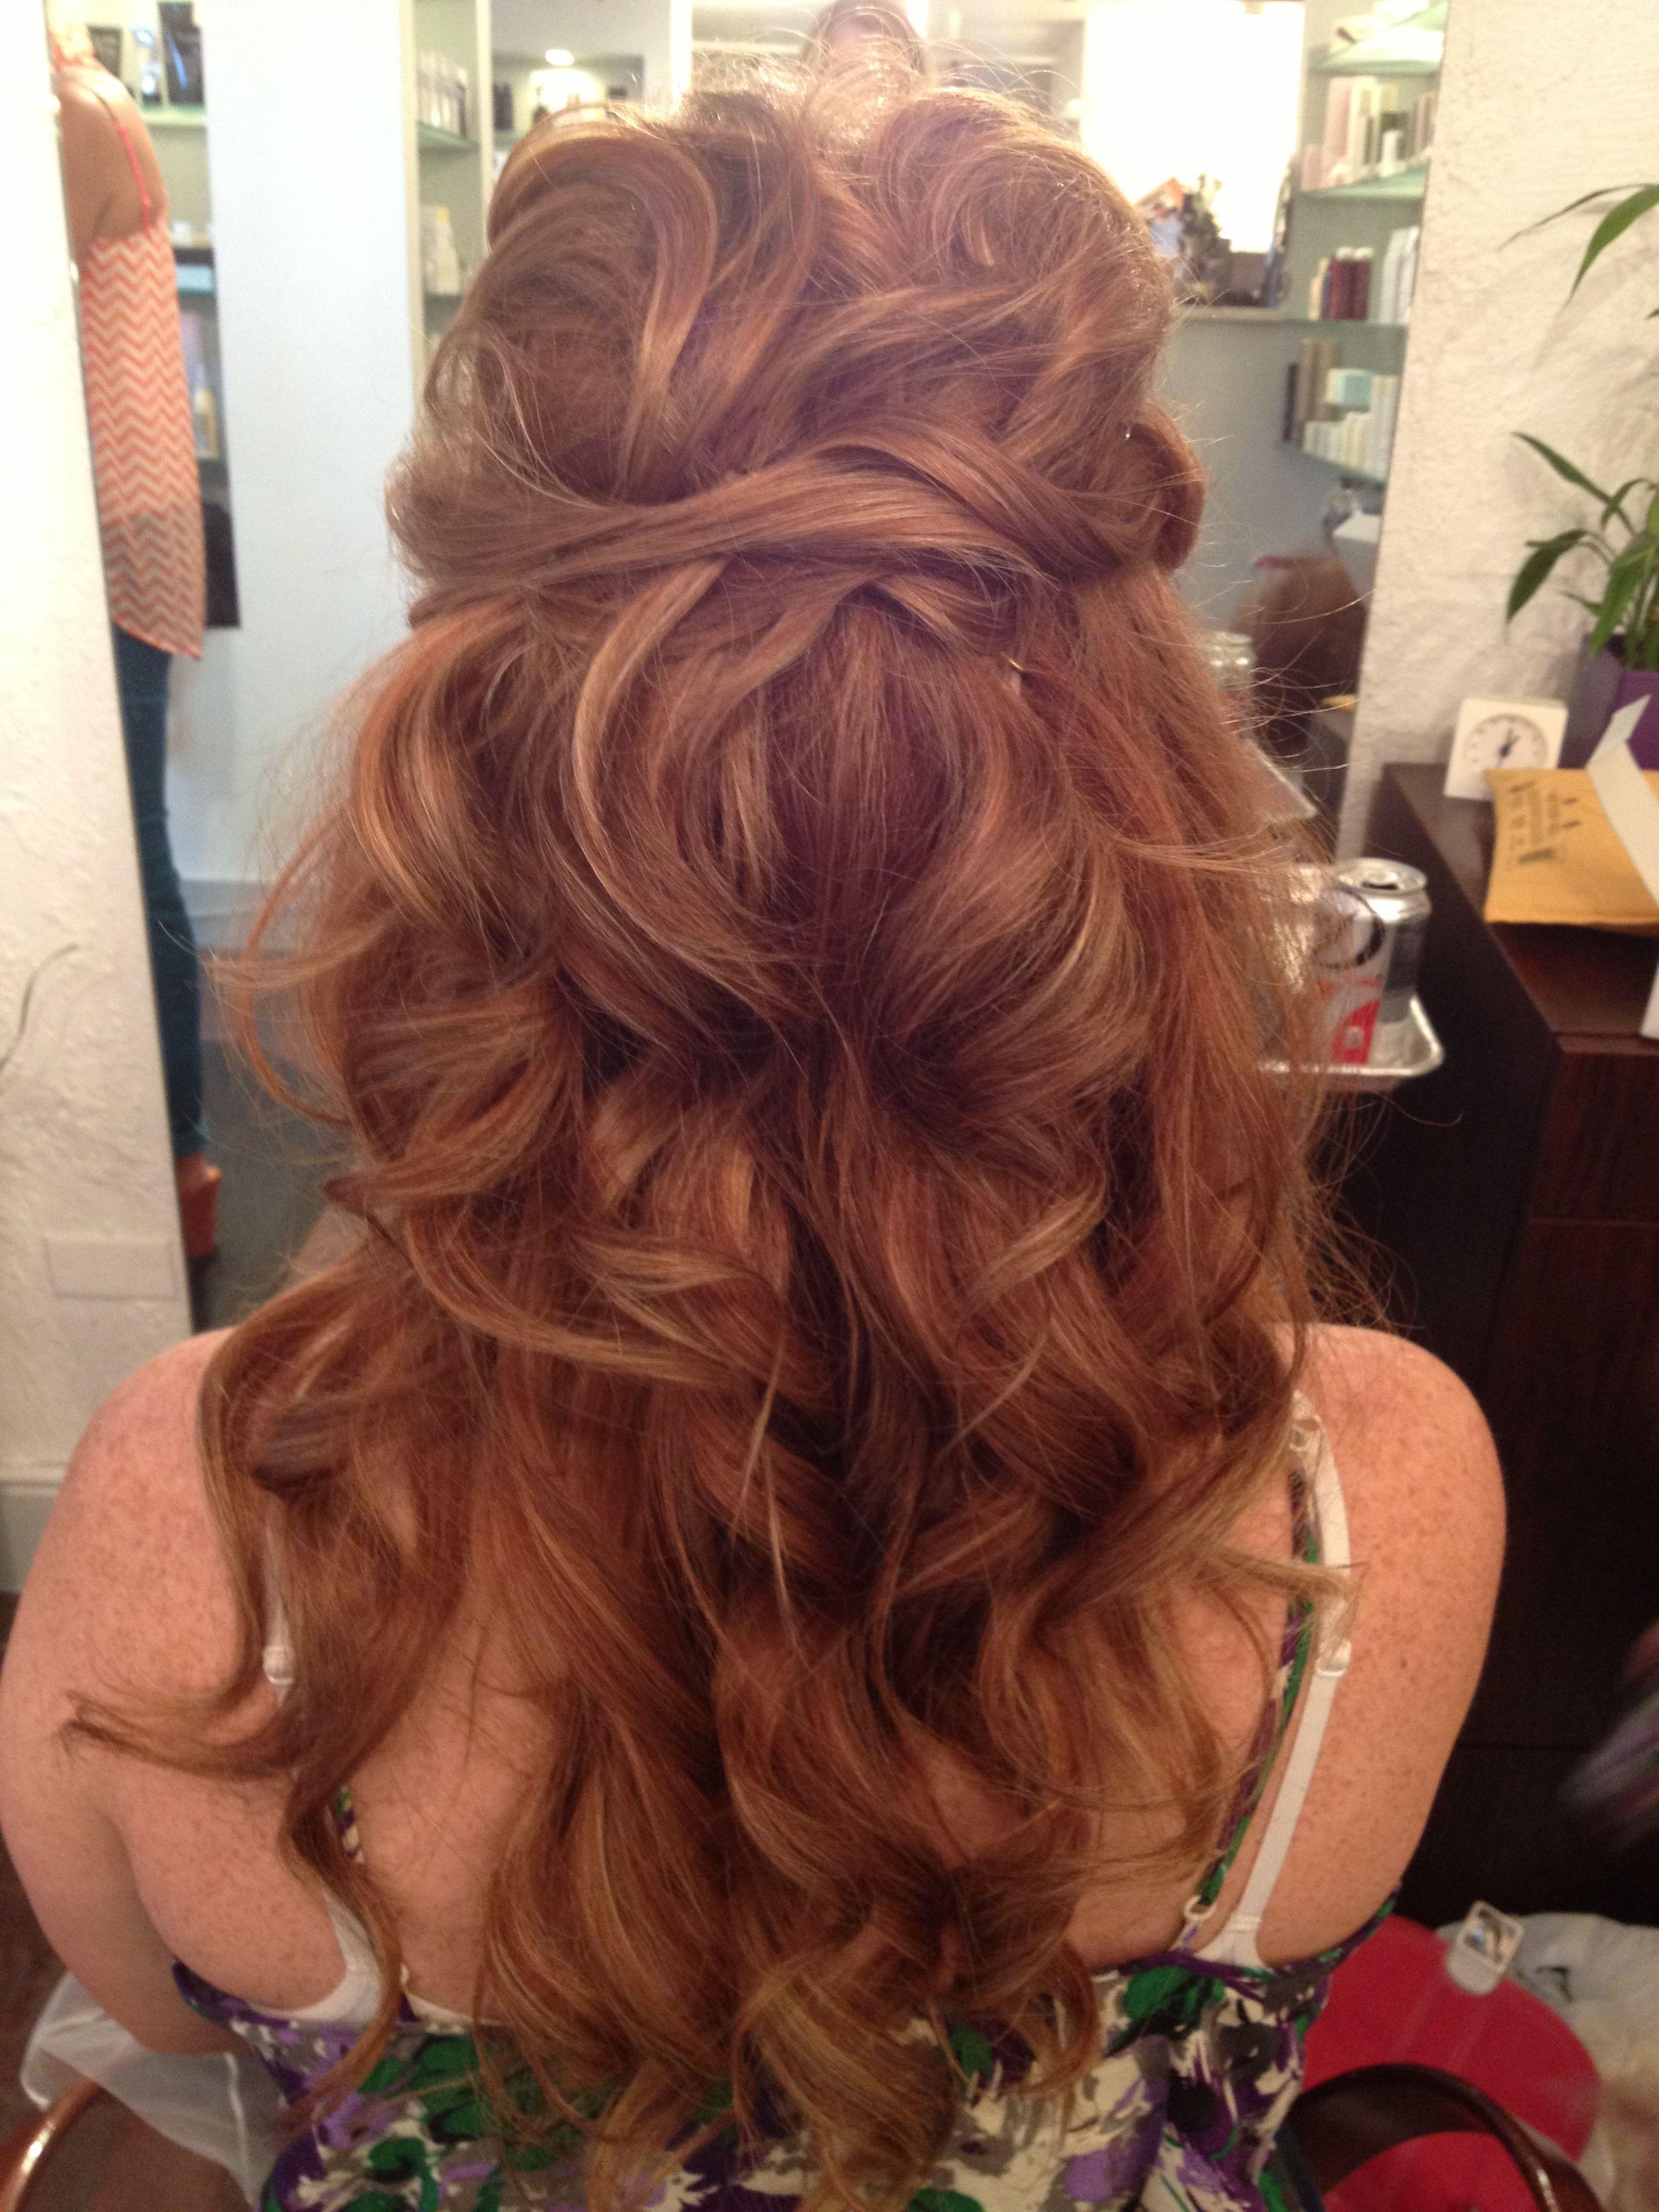 15 best long wavy hairstyles | hair | curly hair styles